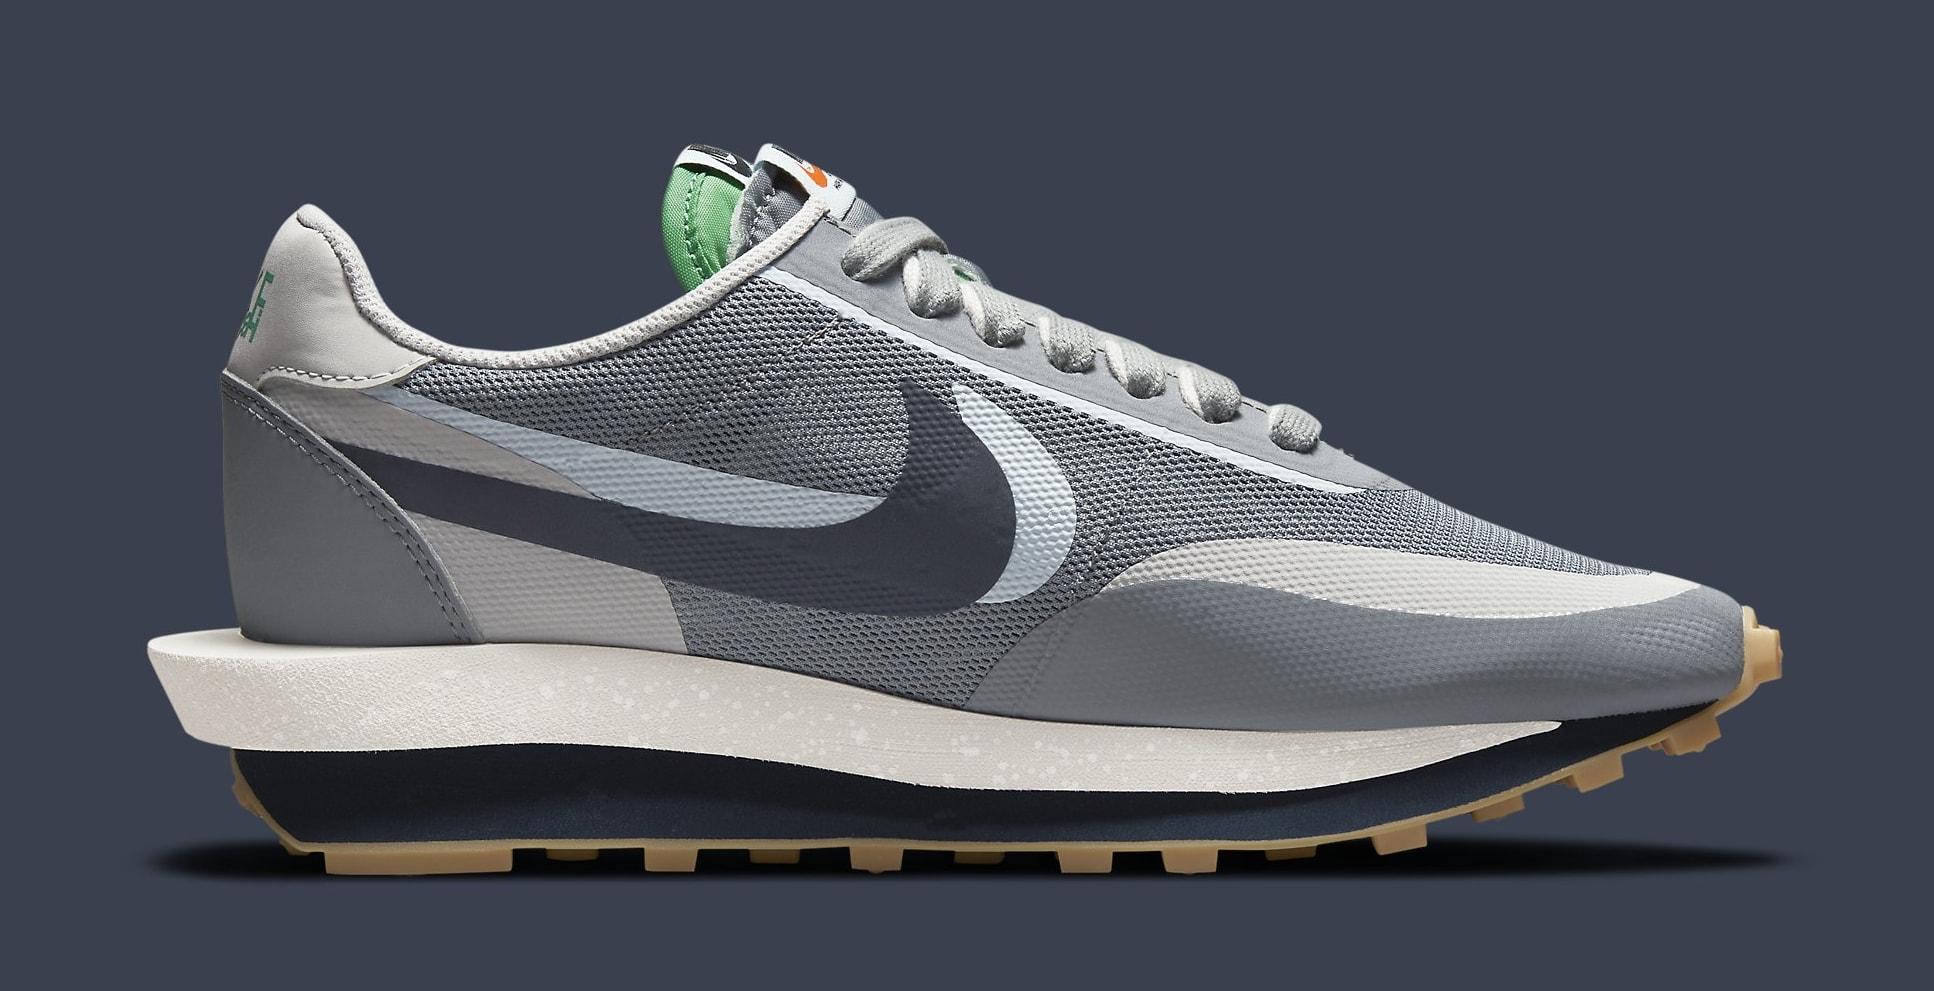 Clot x Sacai x Nike LDWaffle 'Cool Grey' DH3114-001 Medial